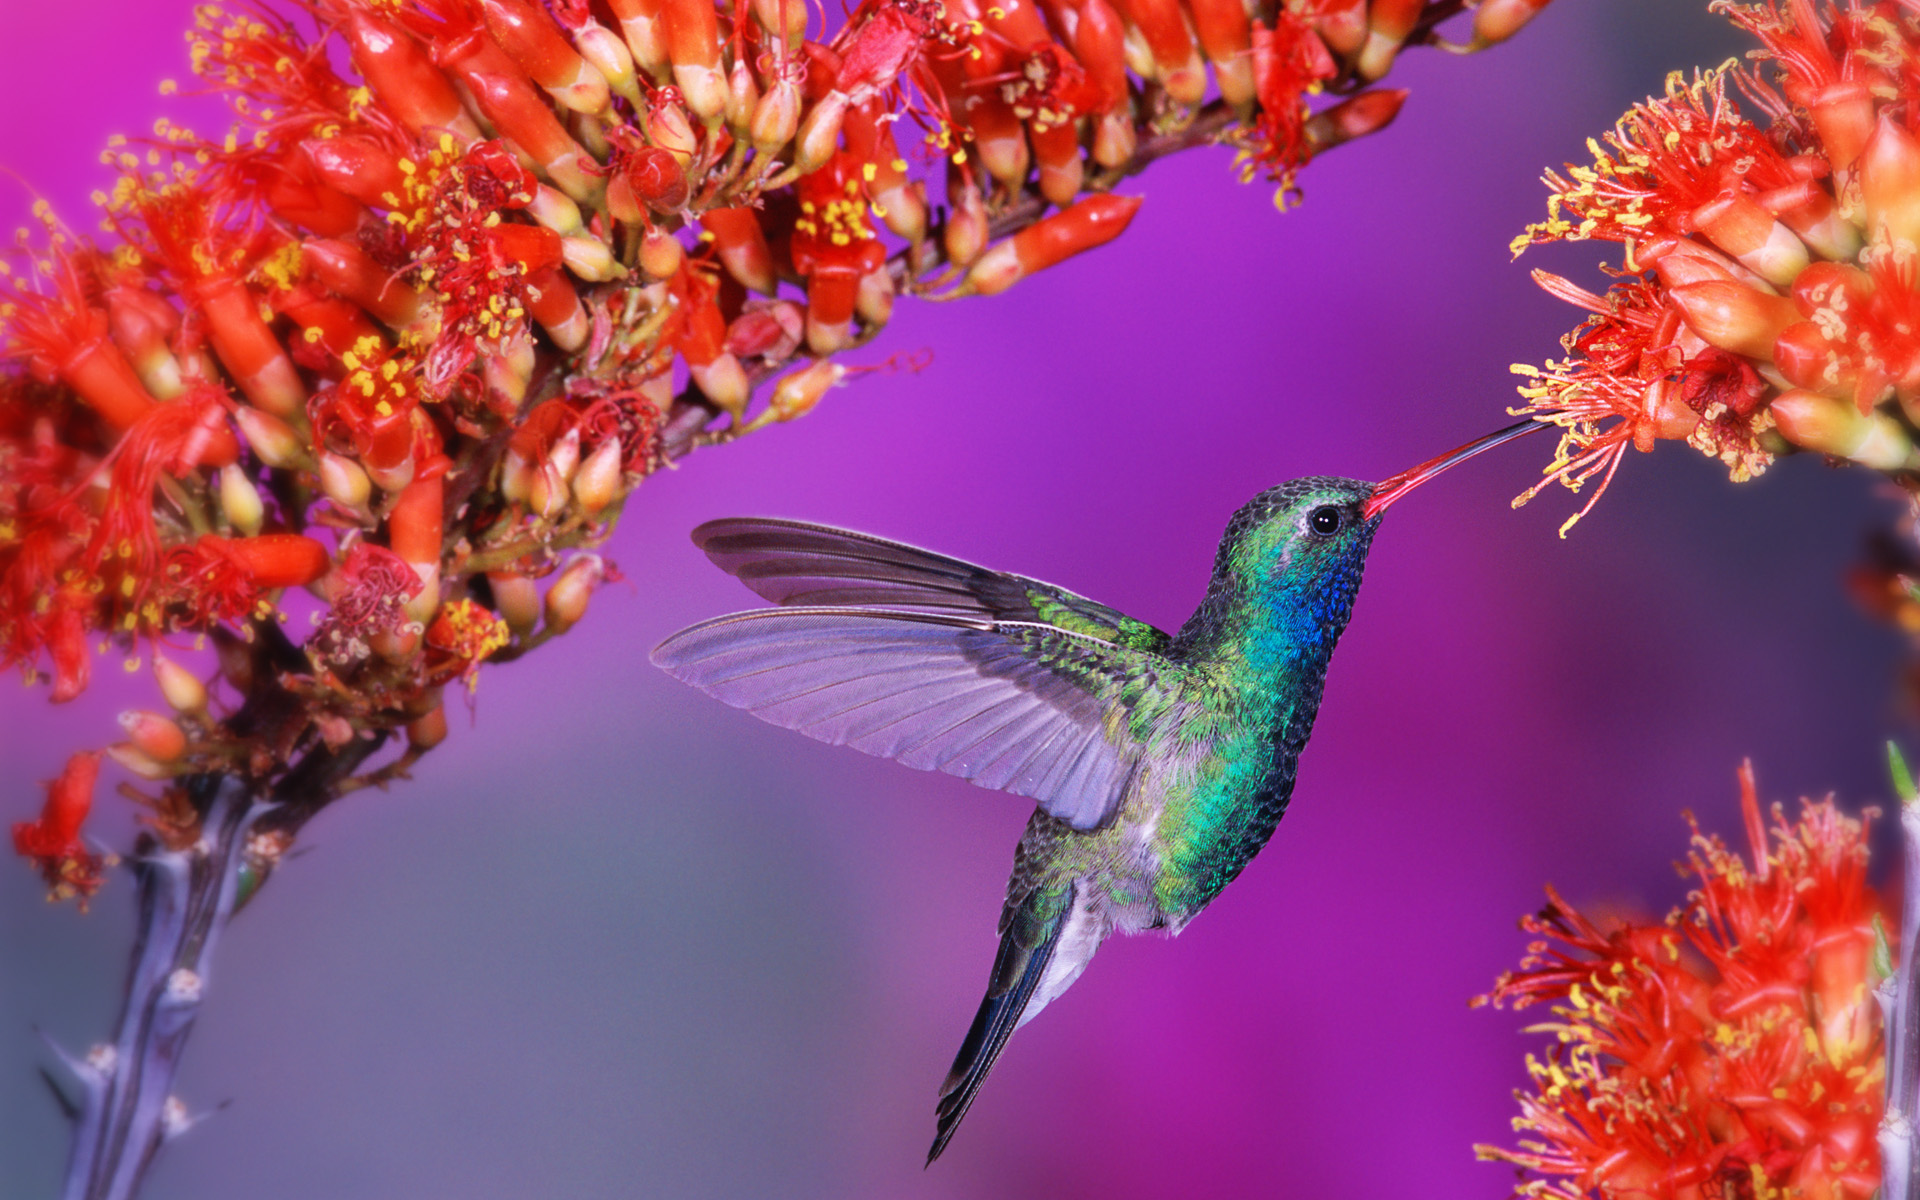 Hummingbird2056111992 - Hummingbird - Hummingbird, Amurshaya